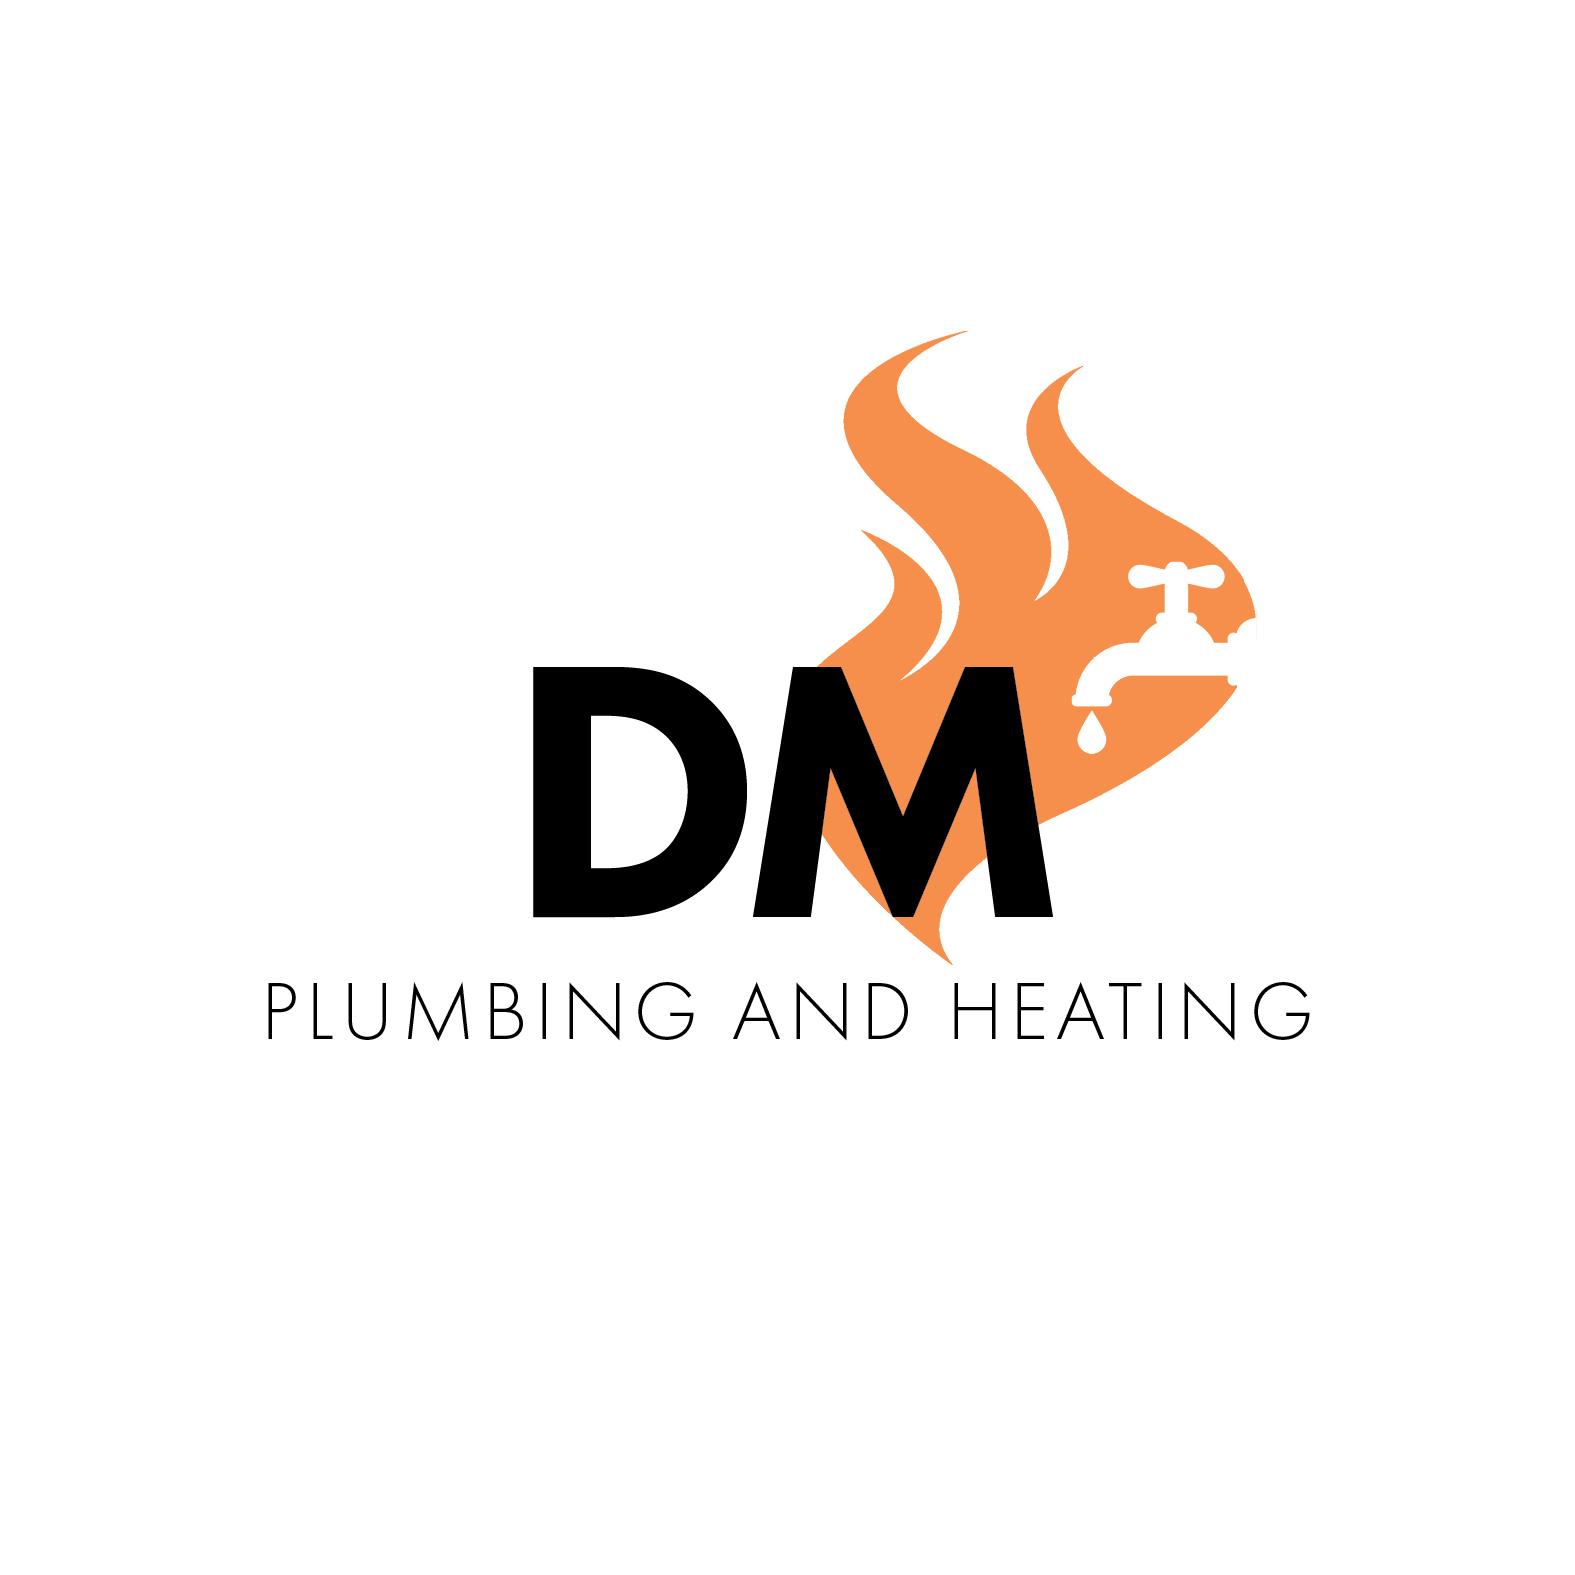 DM-Plumbing And Heating Verified Logo